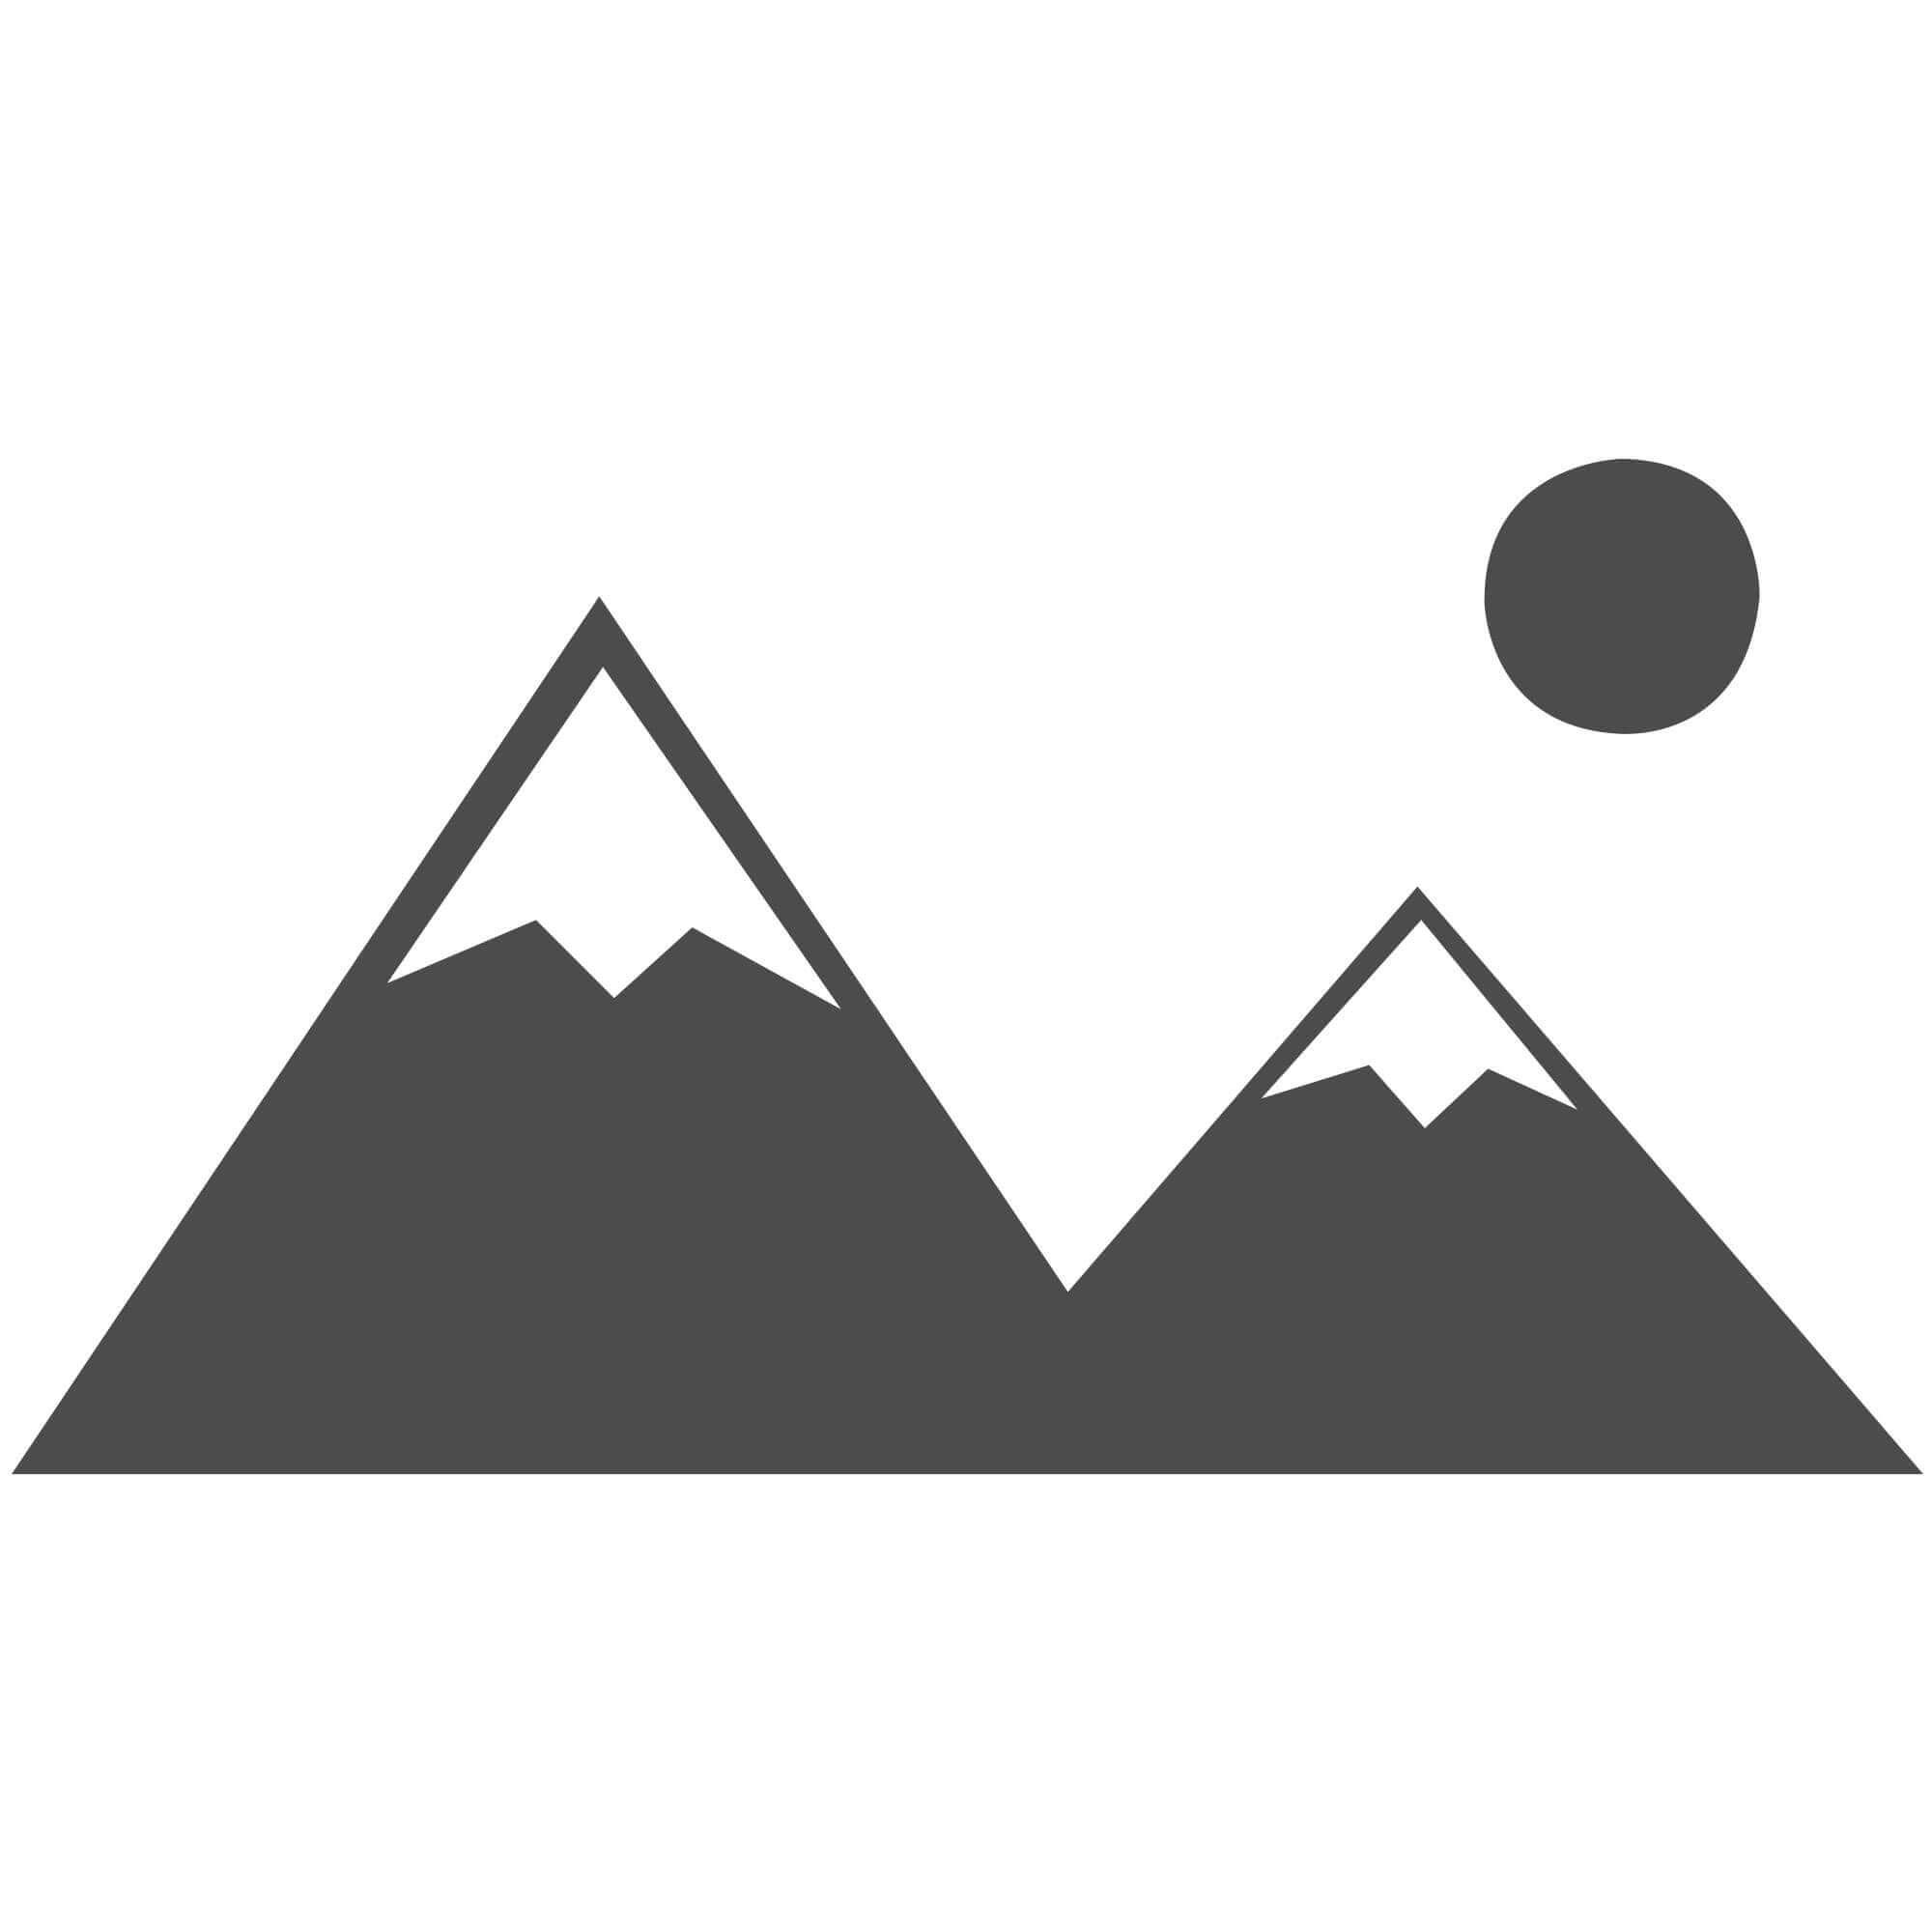 "Nordic Cariboo Shaggy Rug - Orange - Size 80 x 150 cm (2'8"" x 5')"